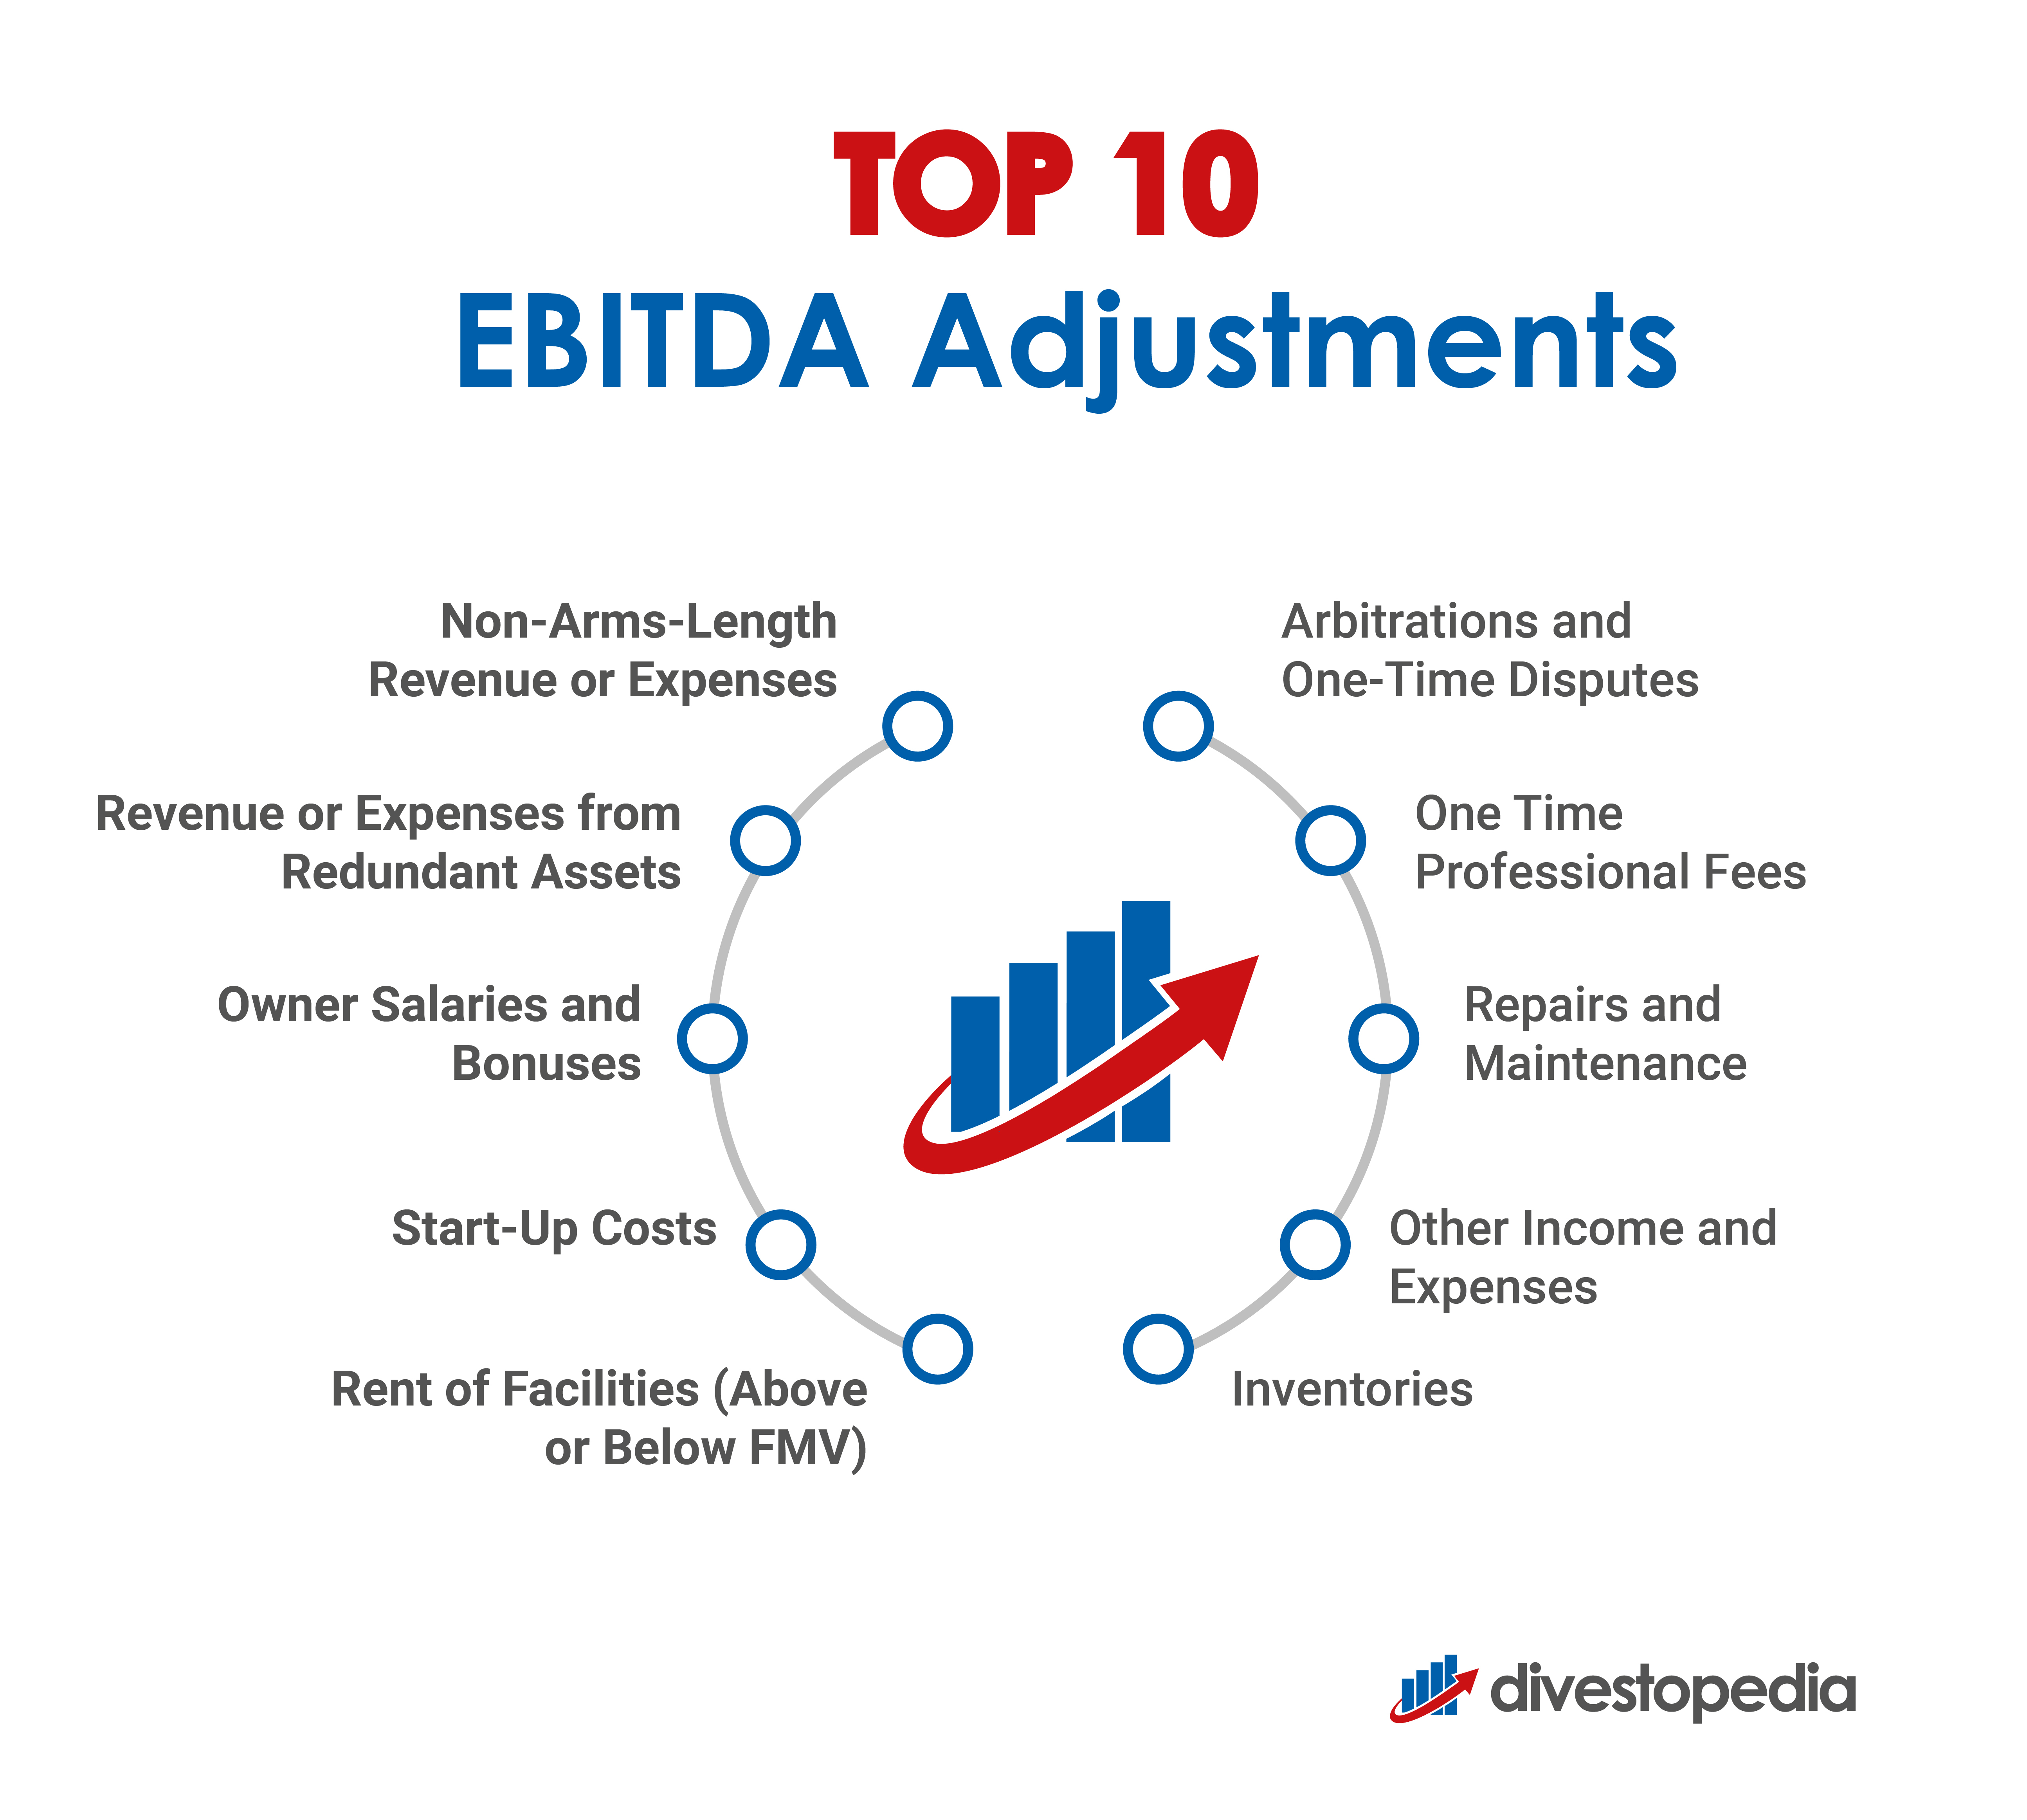 EBITDA Adjustments Before Selling a Company